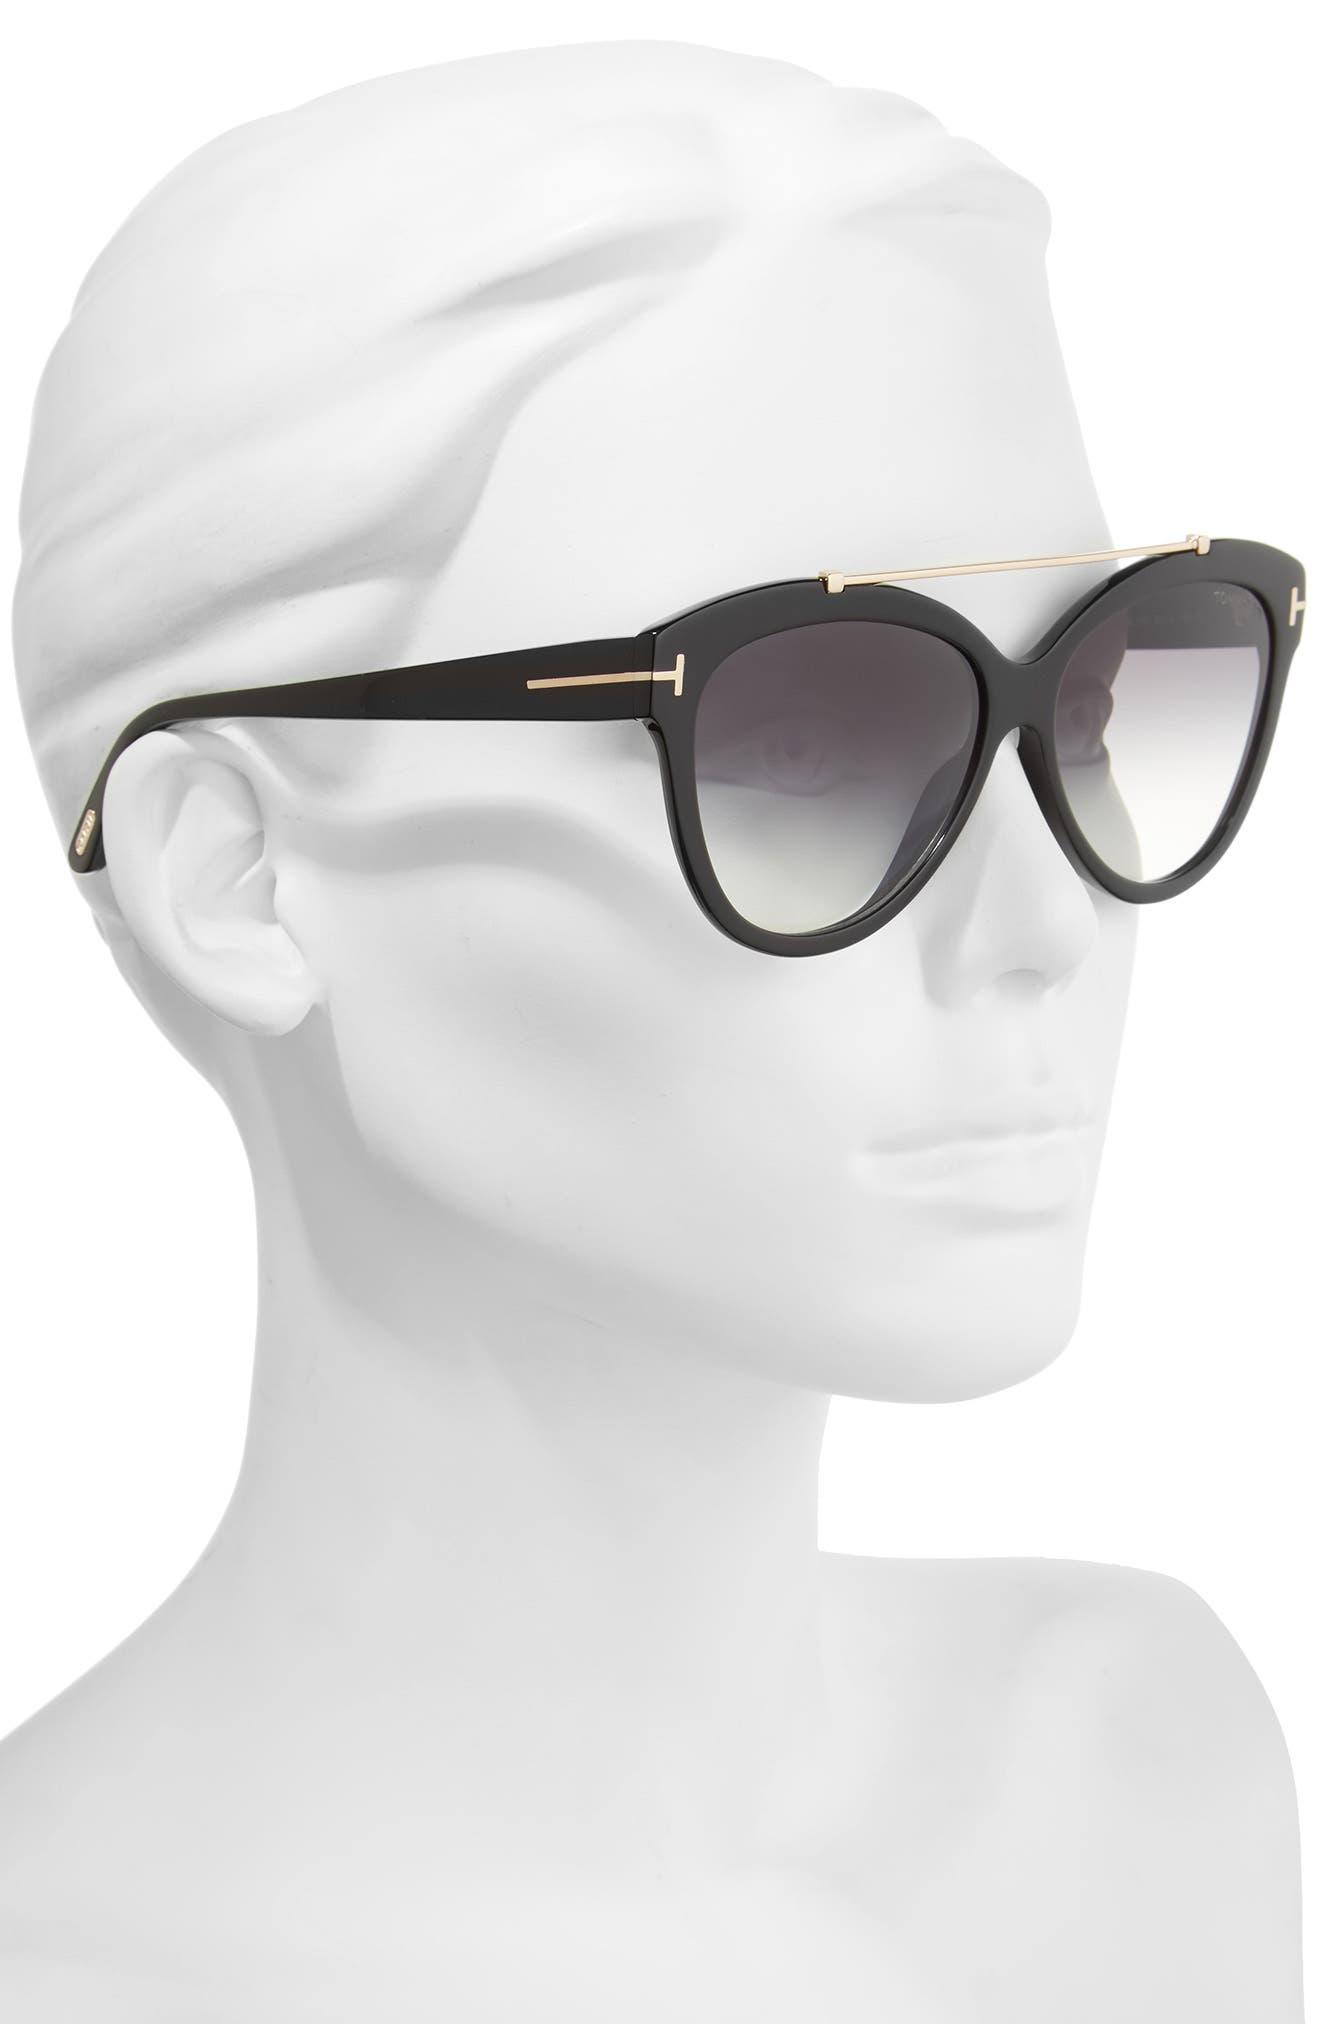 Livia 58mm Gradient Butterfly Sunglasses,                             Alternate thumbnail 2, color,                             001